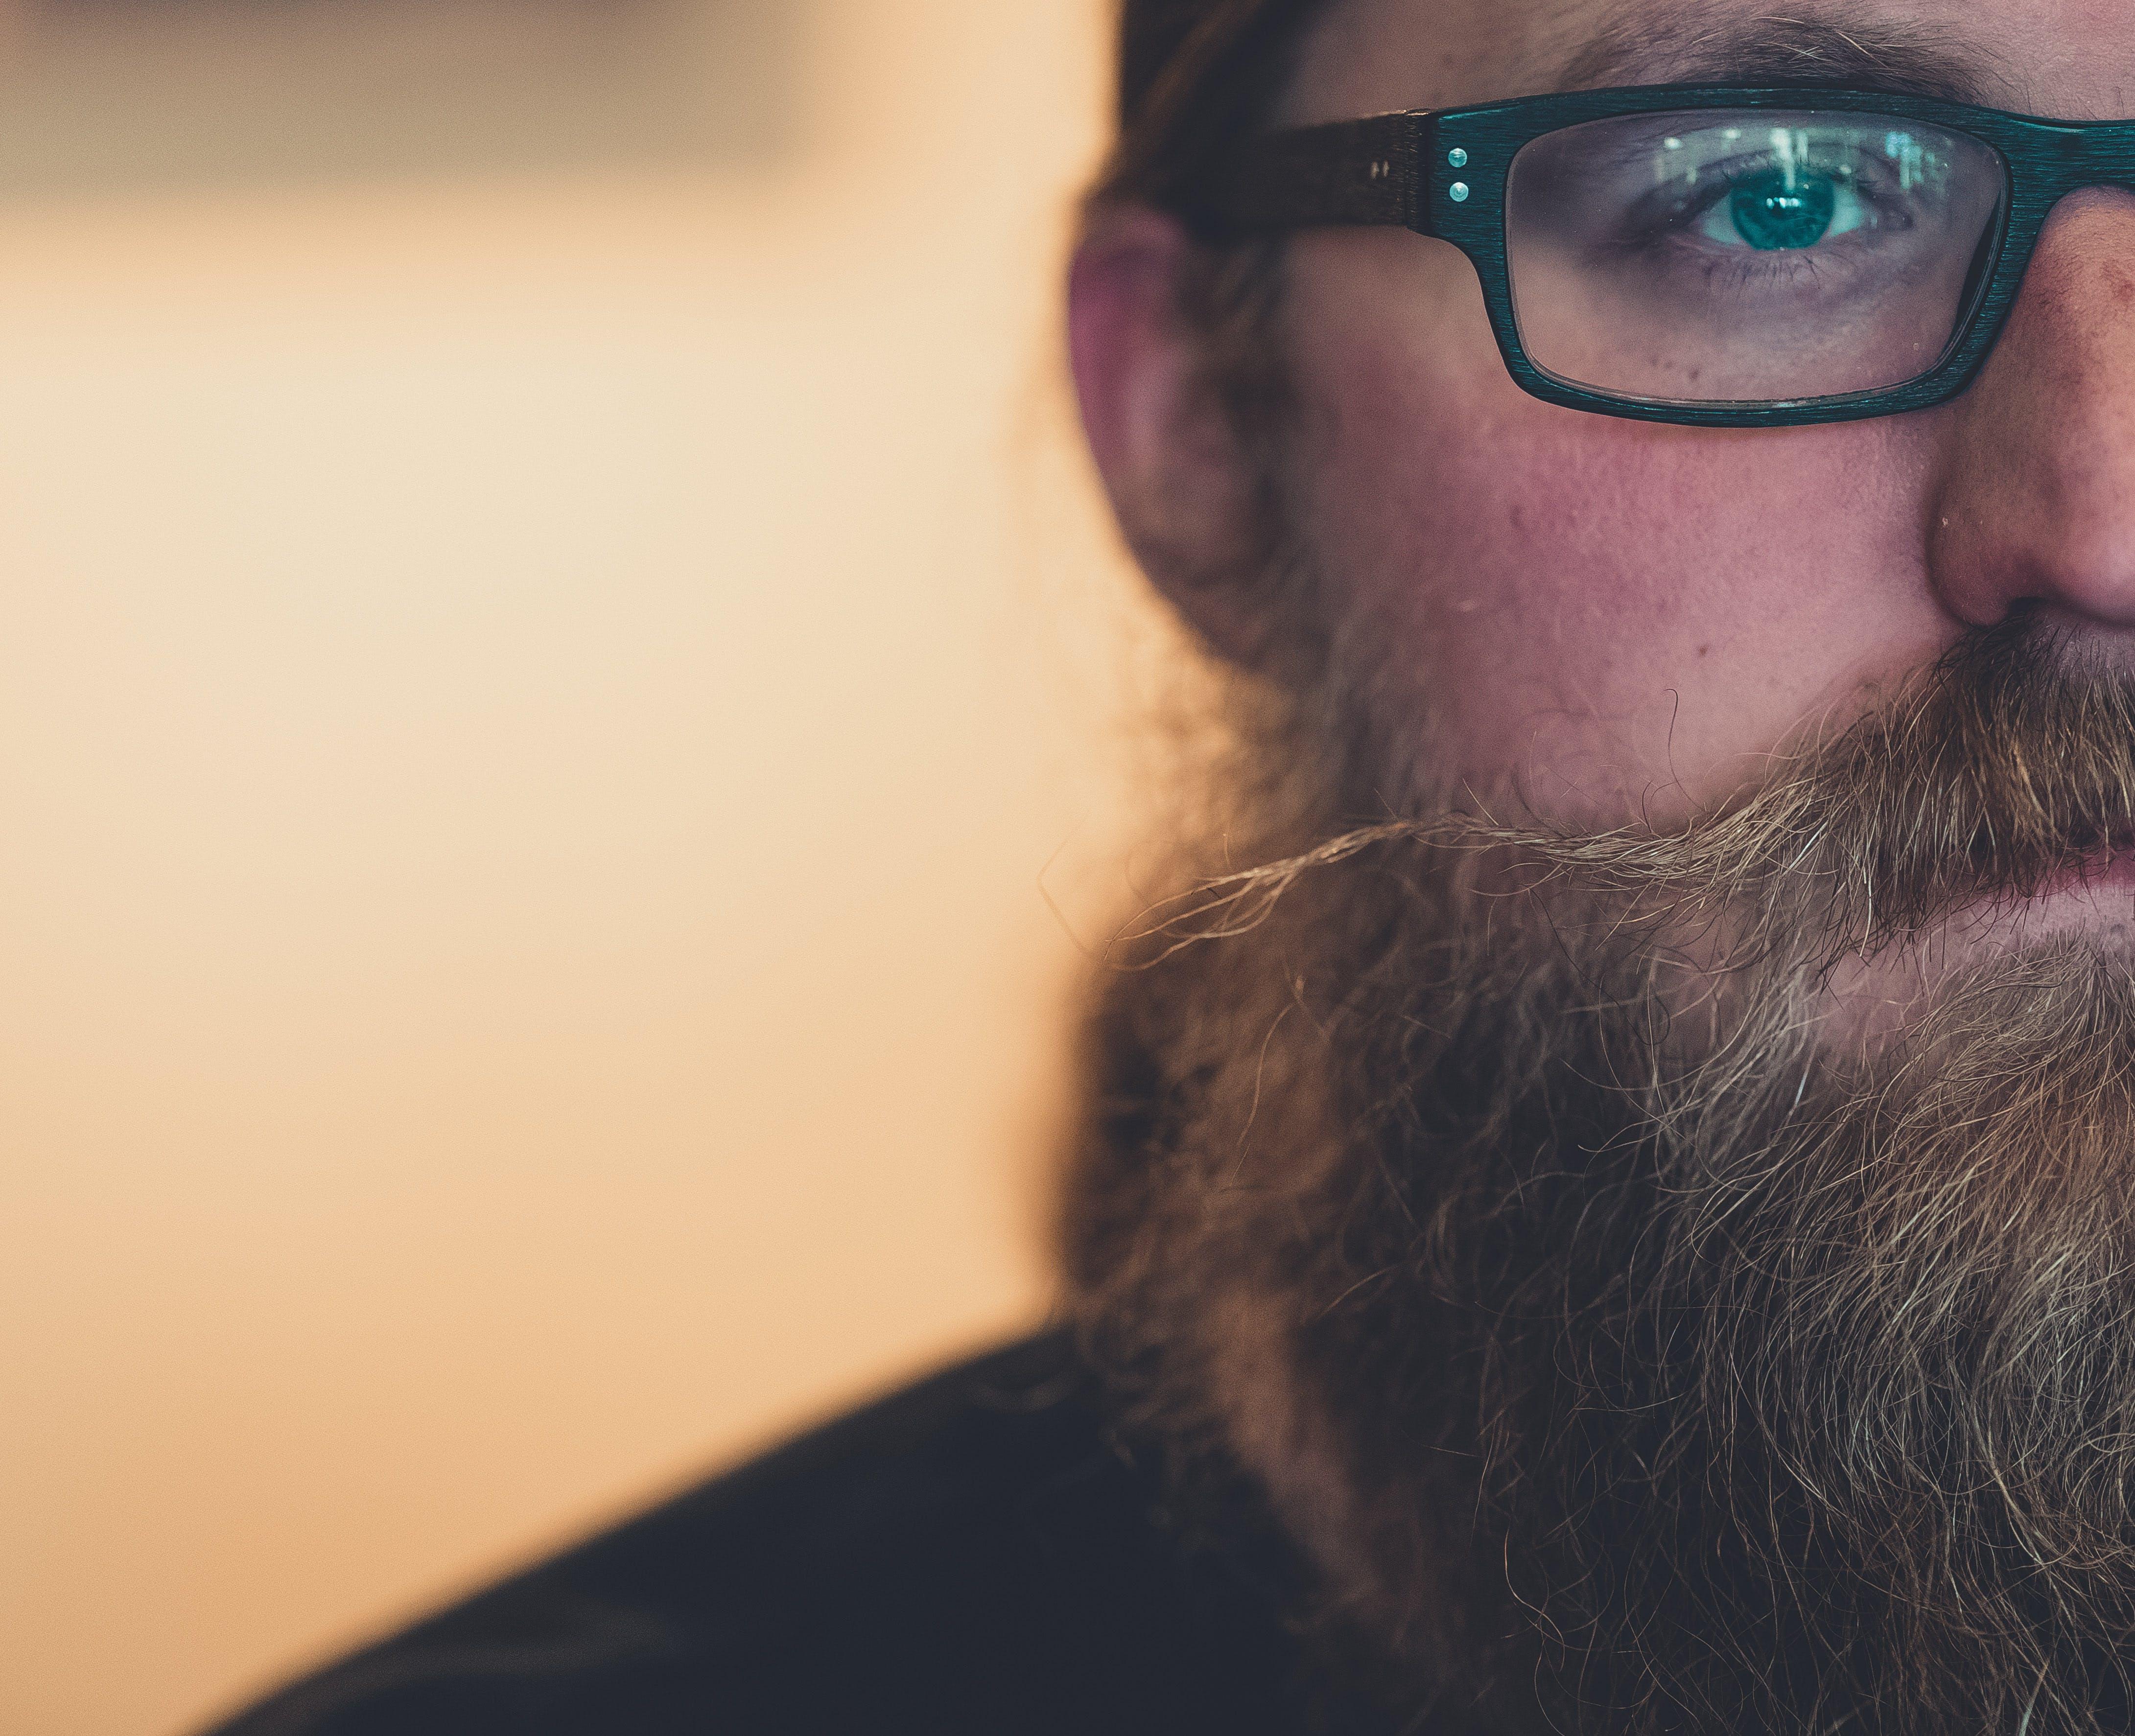 Close-Up Photo of Man Wearing Eyeglasses